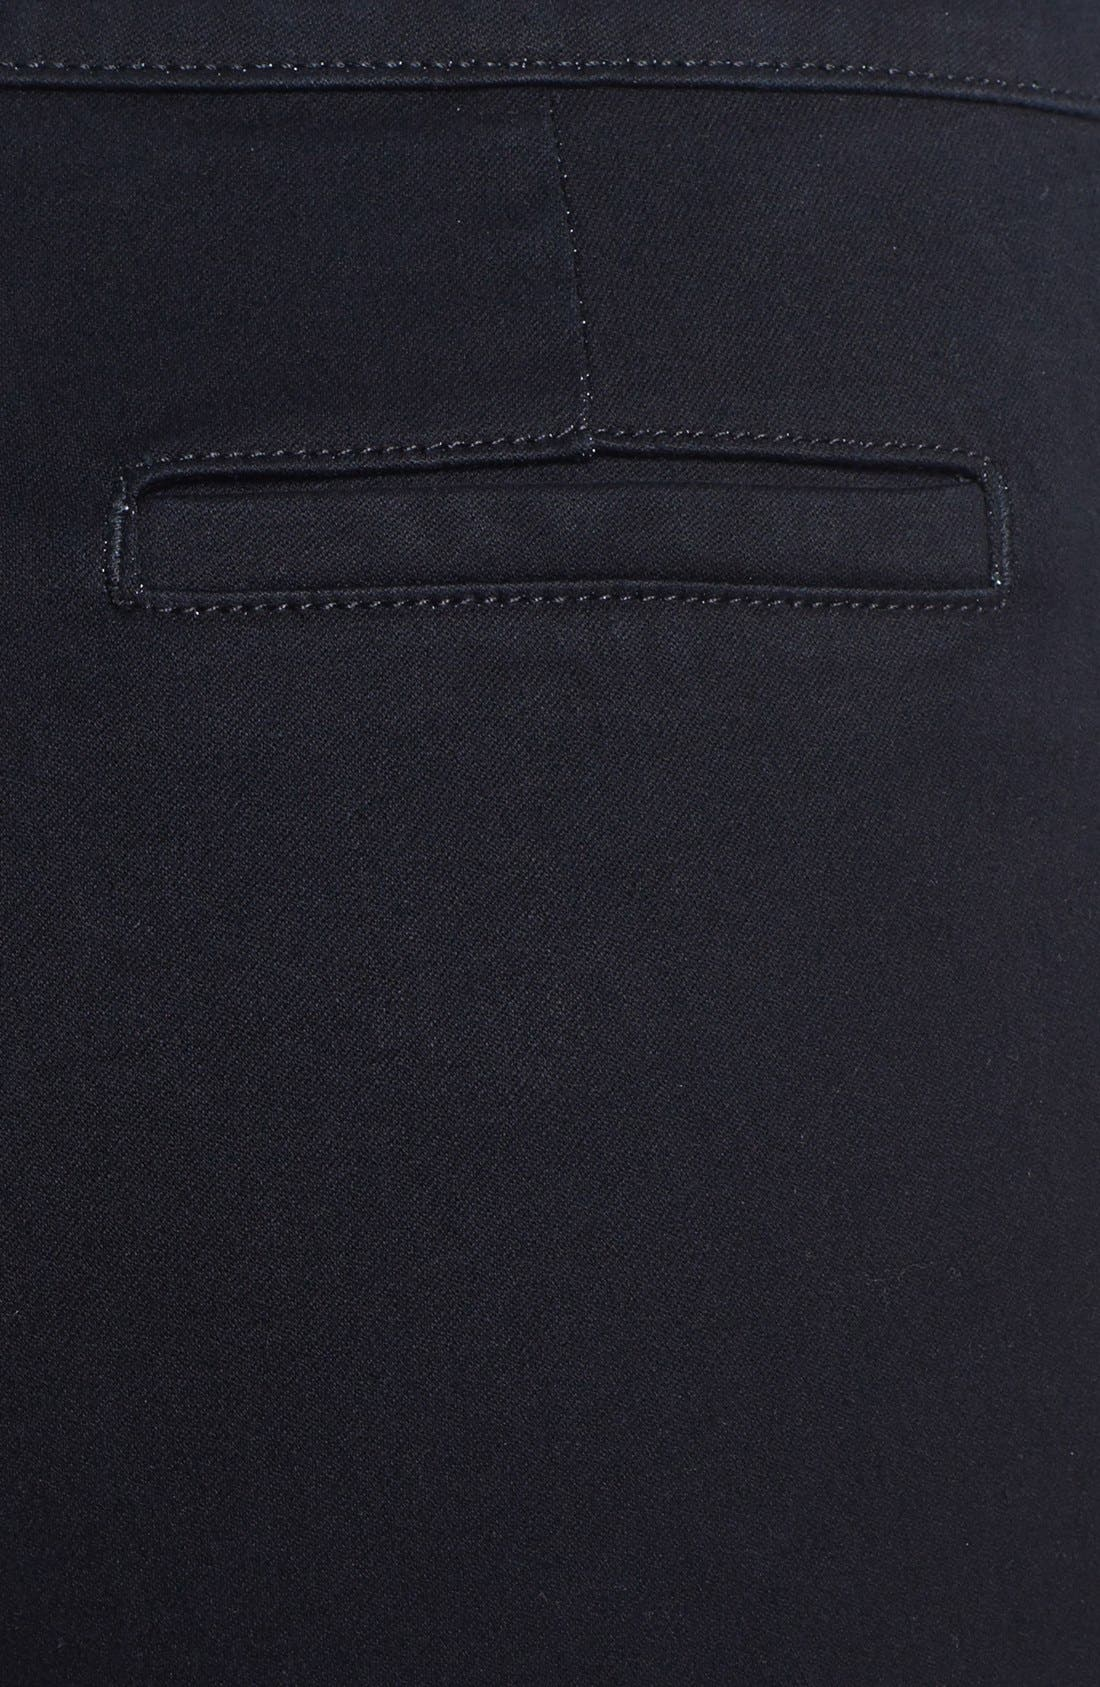 Alternate Image 3  - NYDJ 'Lotus' Stretch Skinny Jeans (Overdye Black)